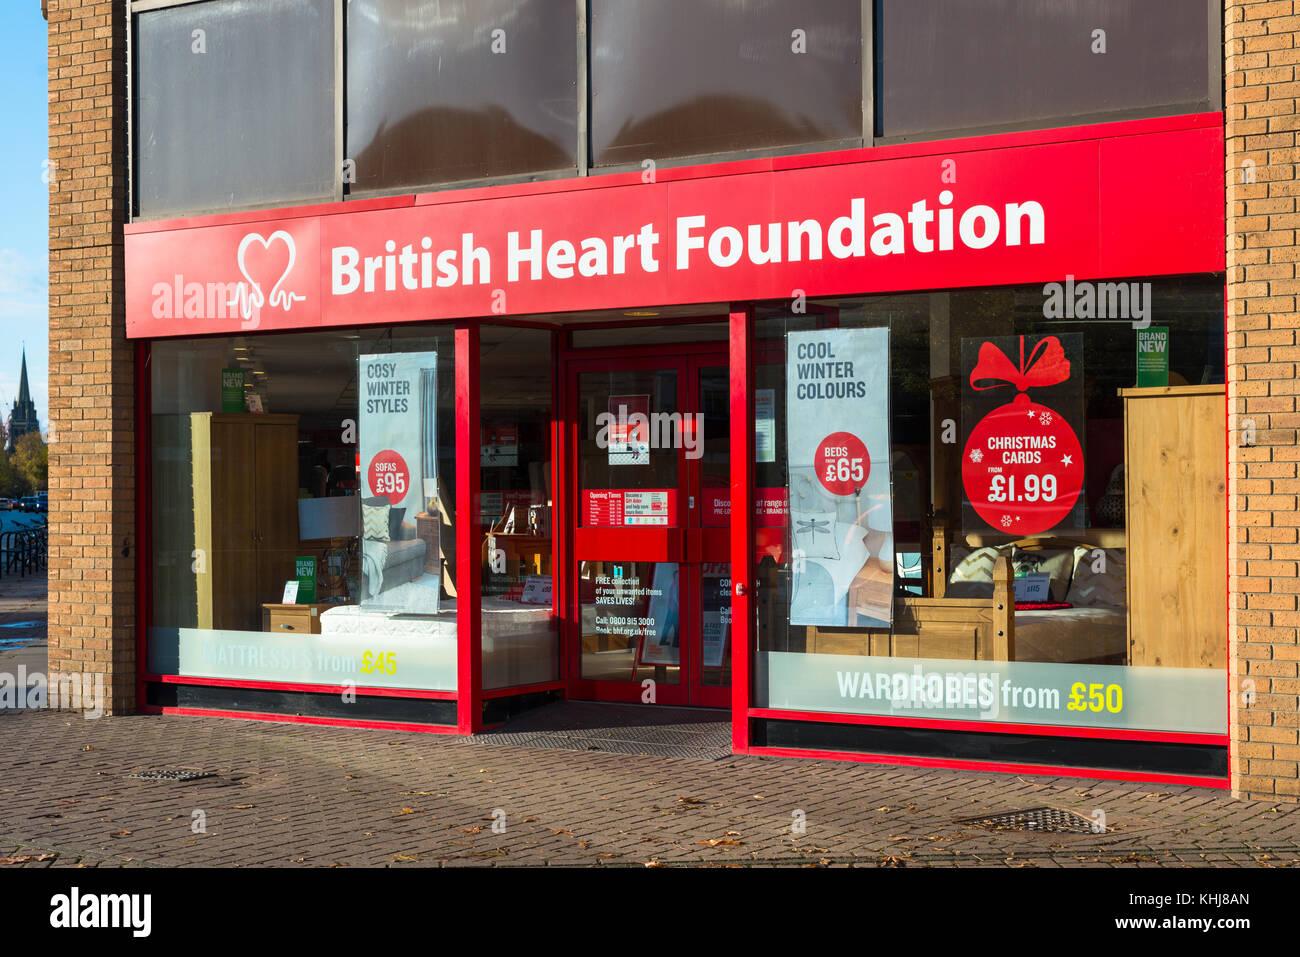 9775d9b5c61b3e British Heart Foundation Stock Photos   British Heart Foundation ...